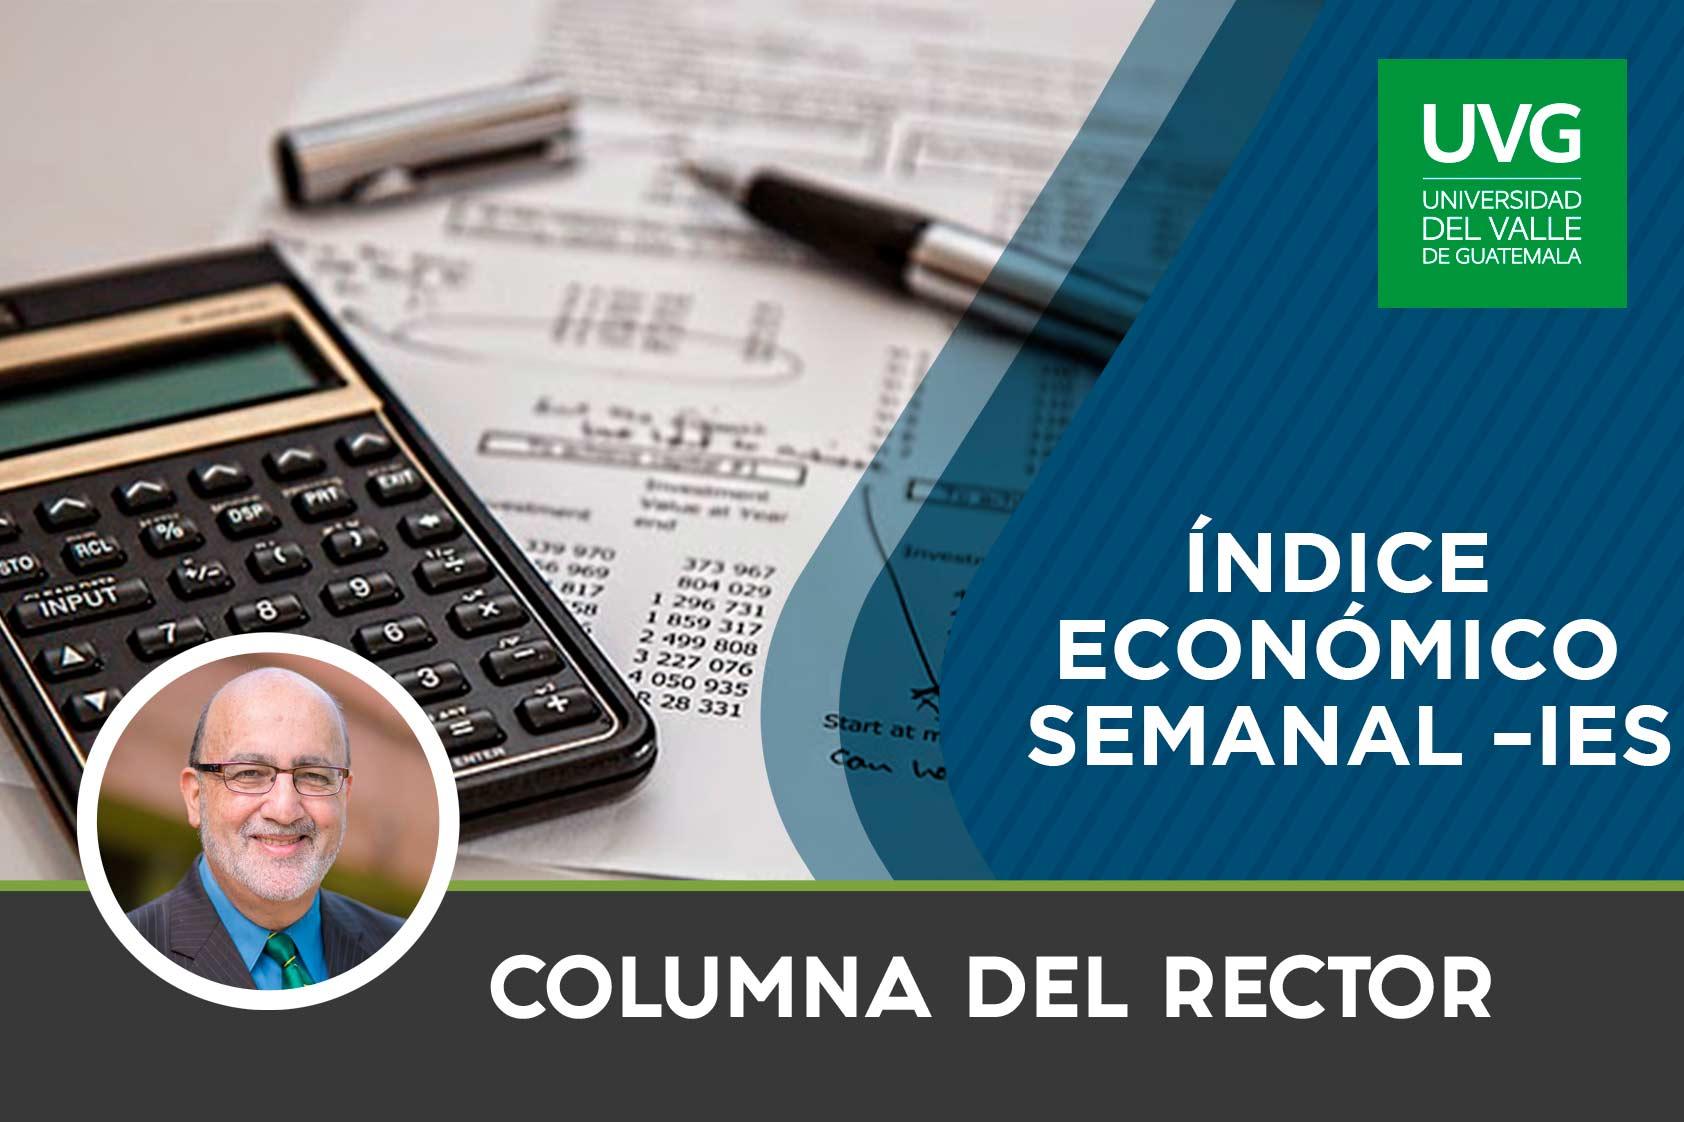 Índice Económico Semanal –IES